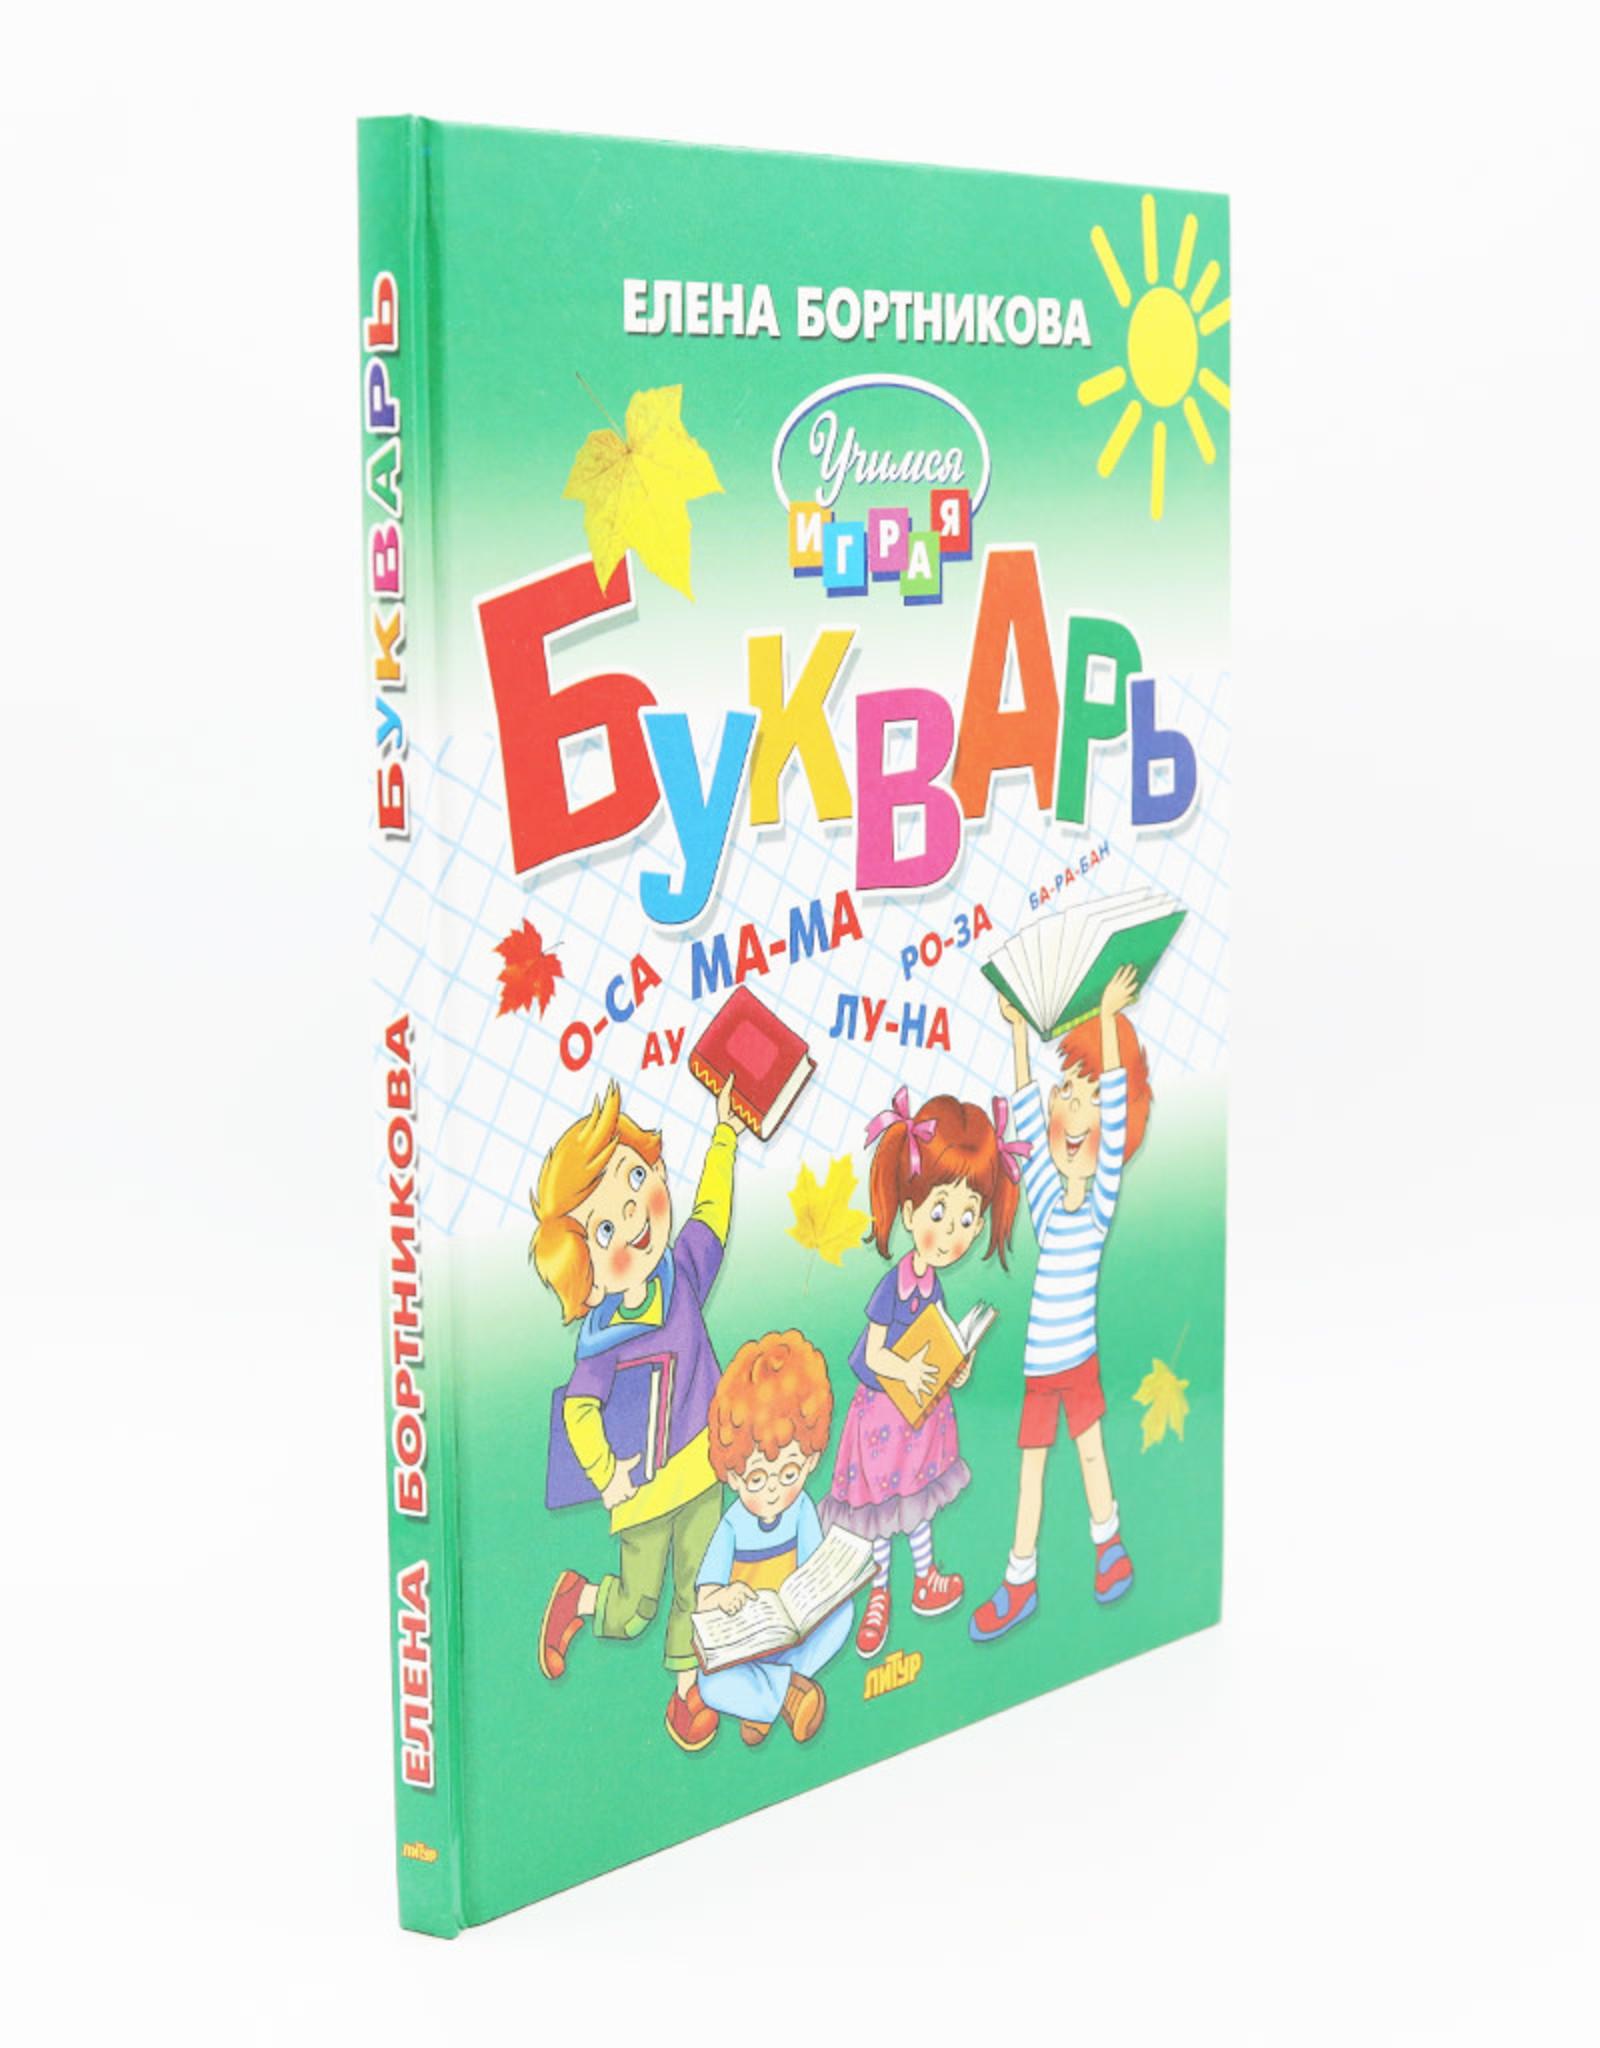 Букварь, Бортникова